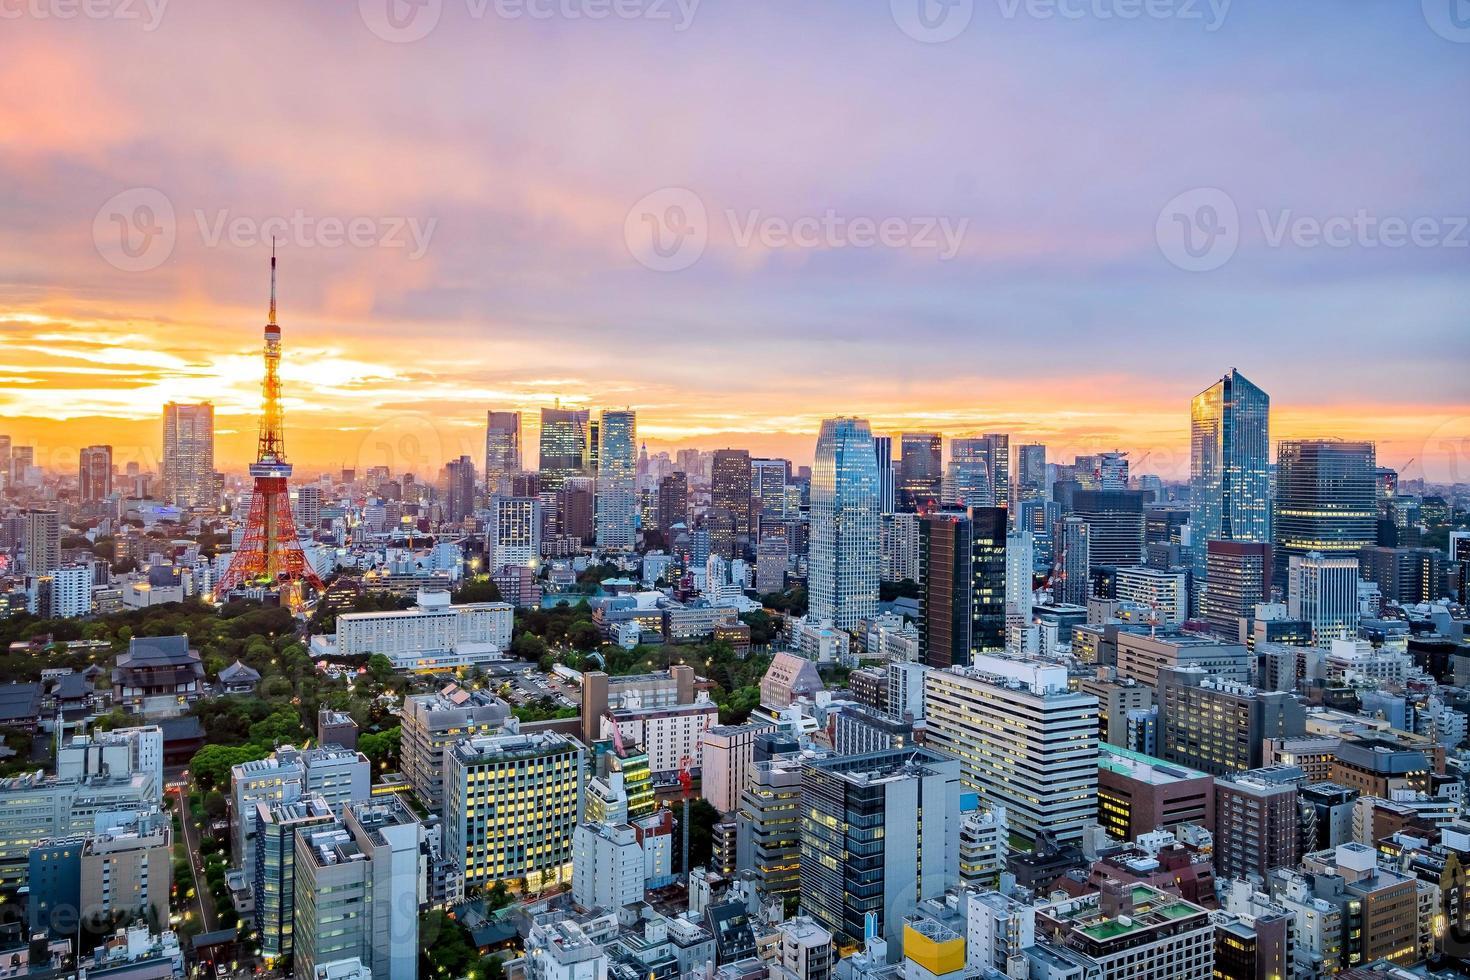 paisaje urbano de tokio al atardecer foto